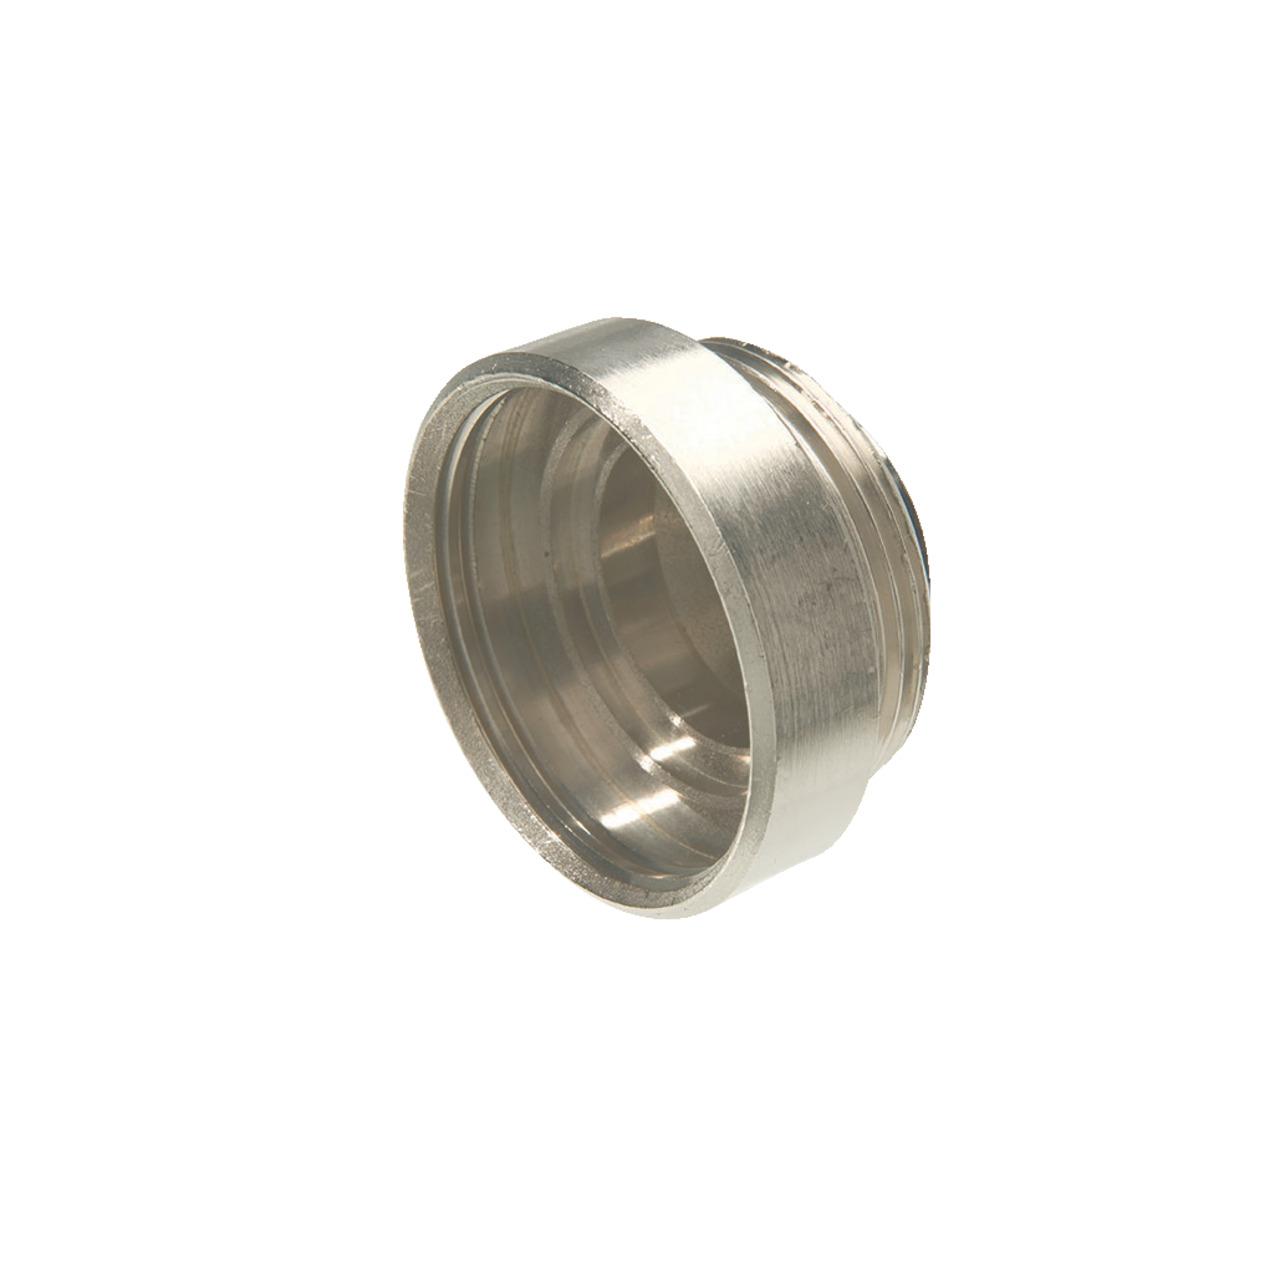 Adapter fund-252 r Heizungsventil Rossweiner M33 x 2-0 mm (Messing)